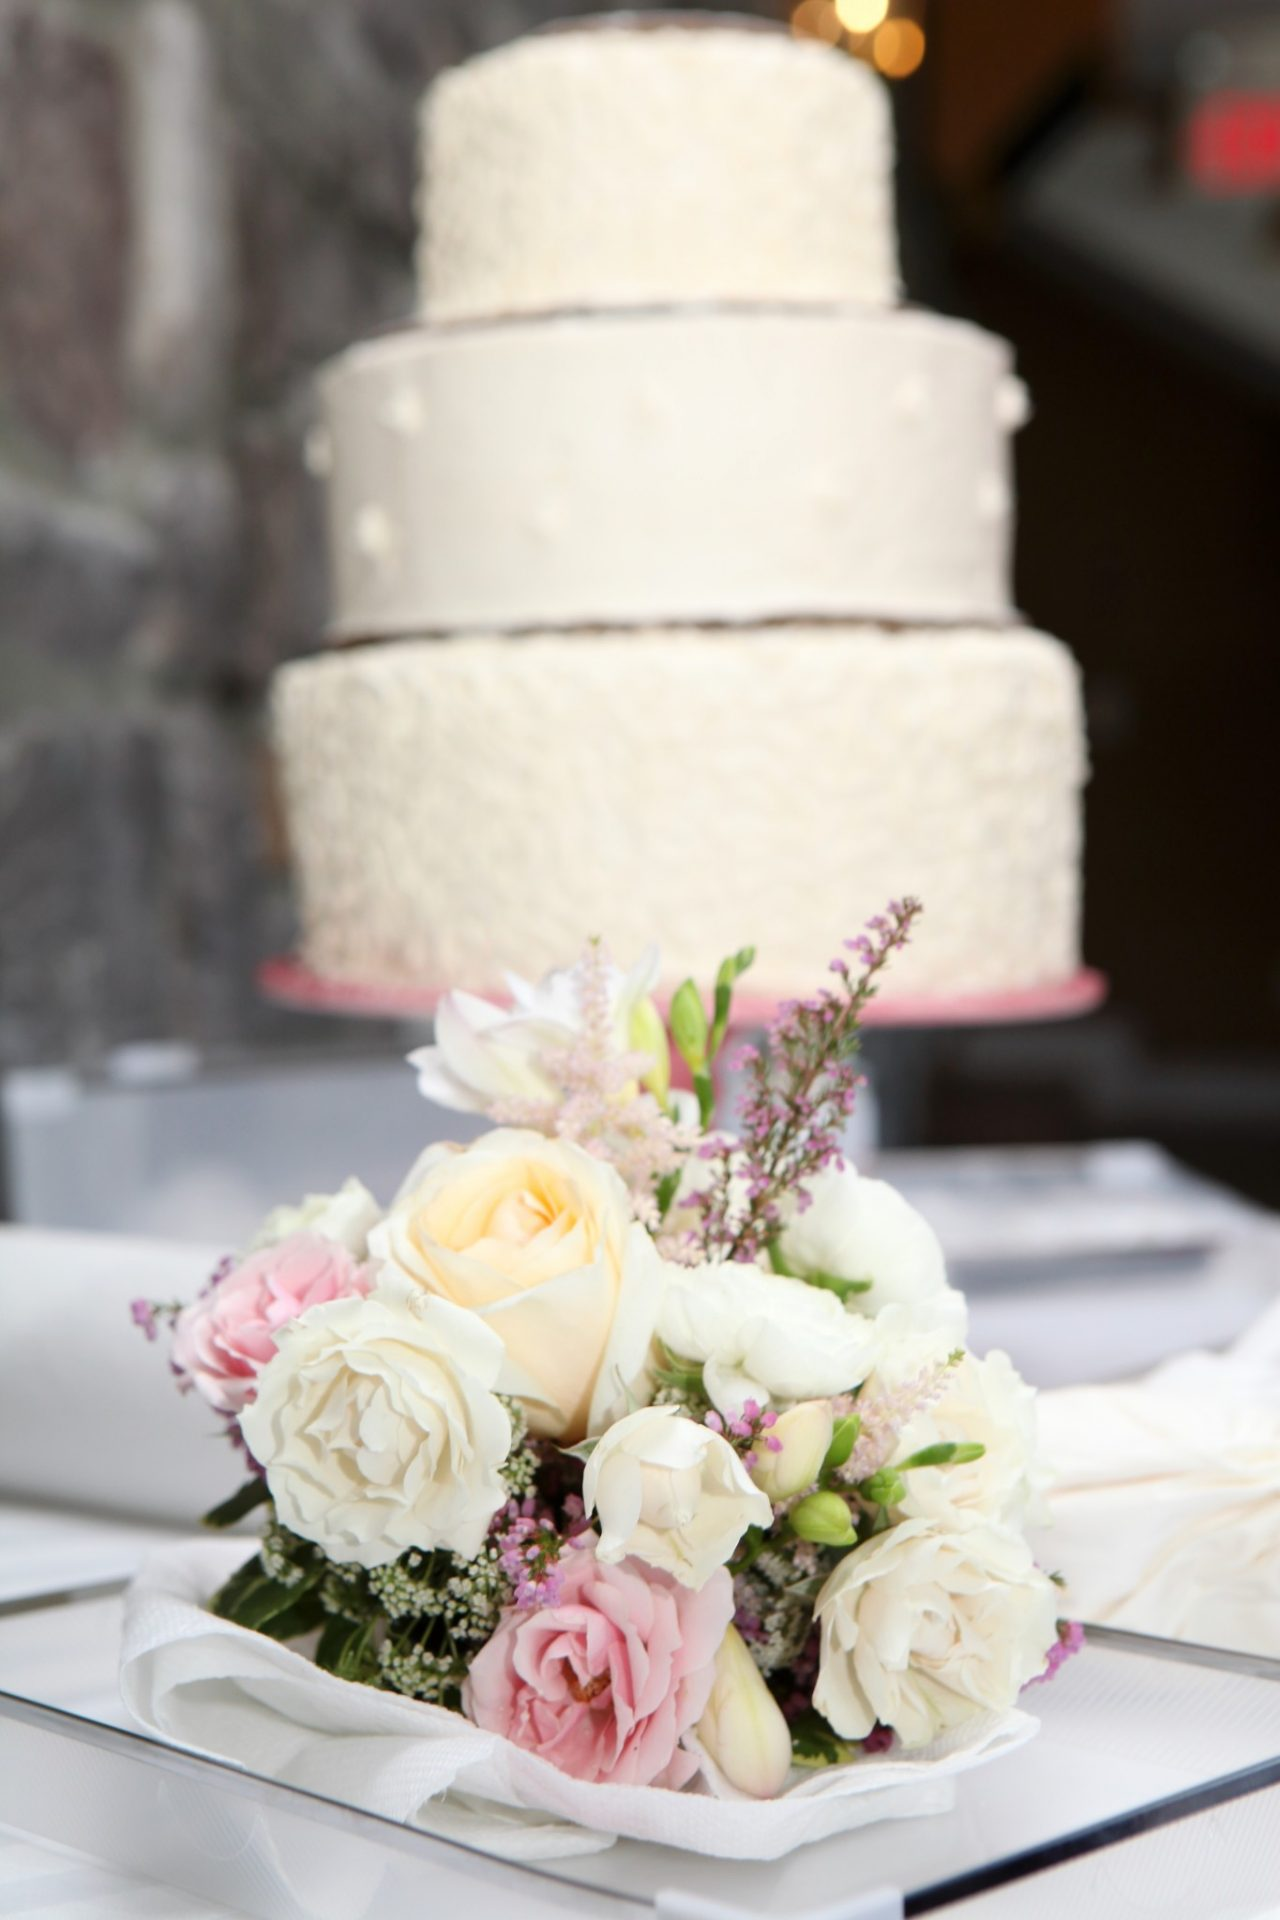 Wedding Reception wedding cake side view